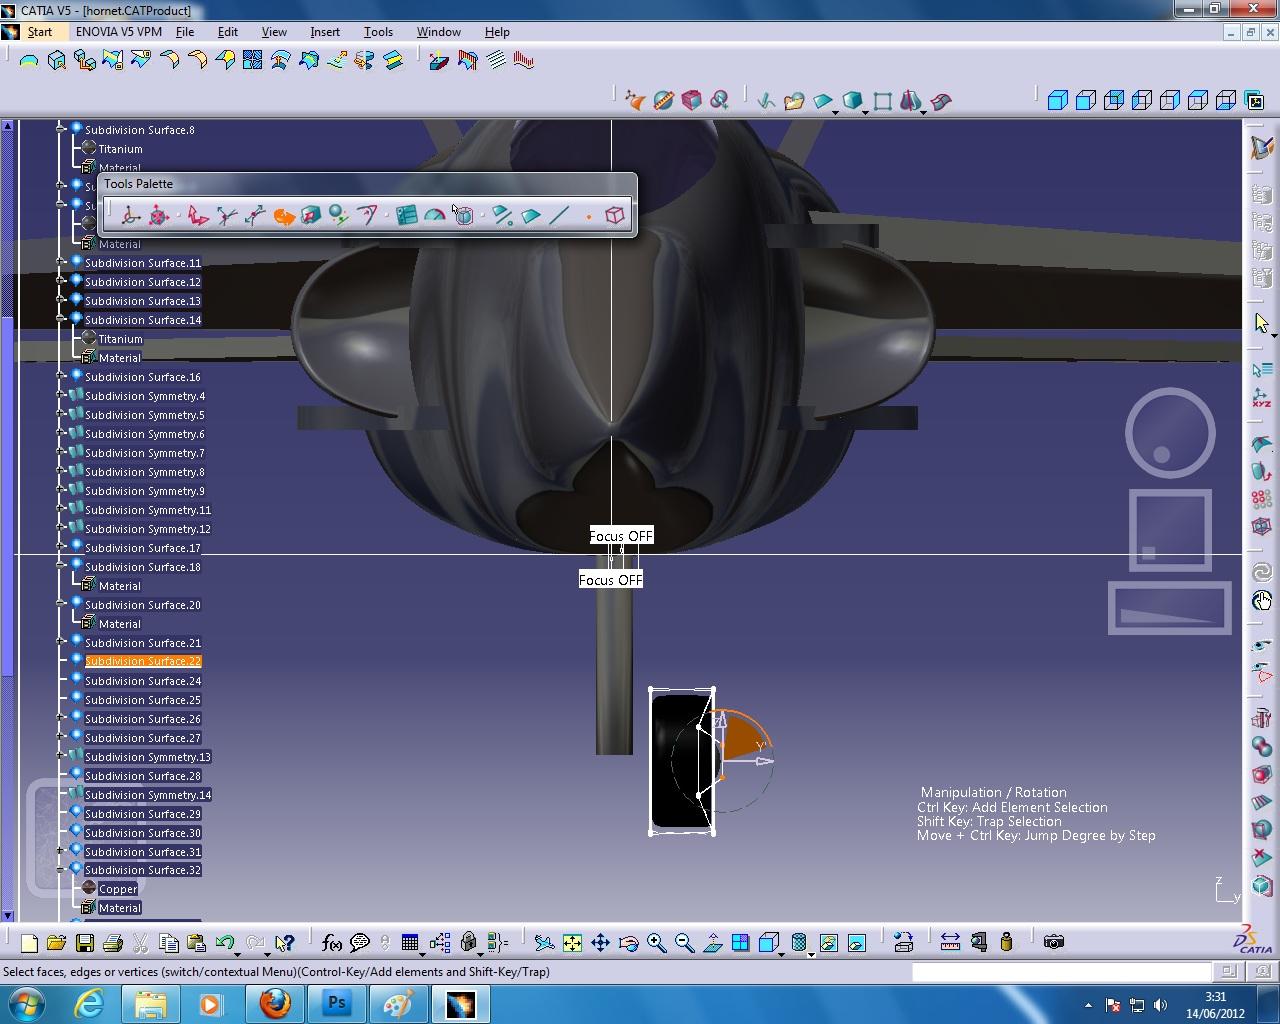 F 18 Hornet In Catia V5 For Final Project Matt Produce